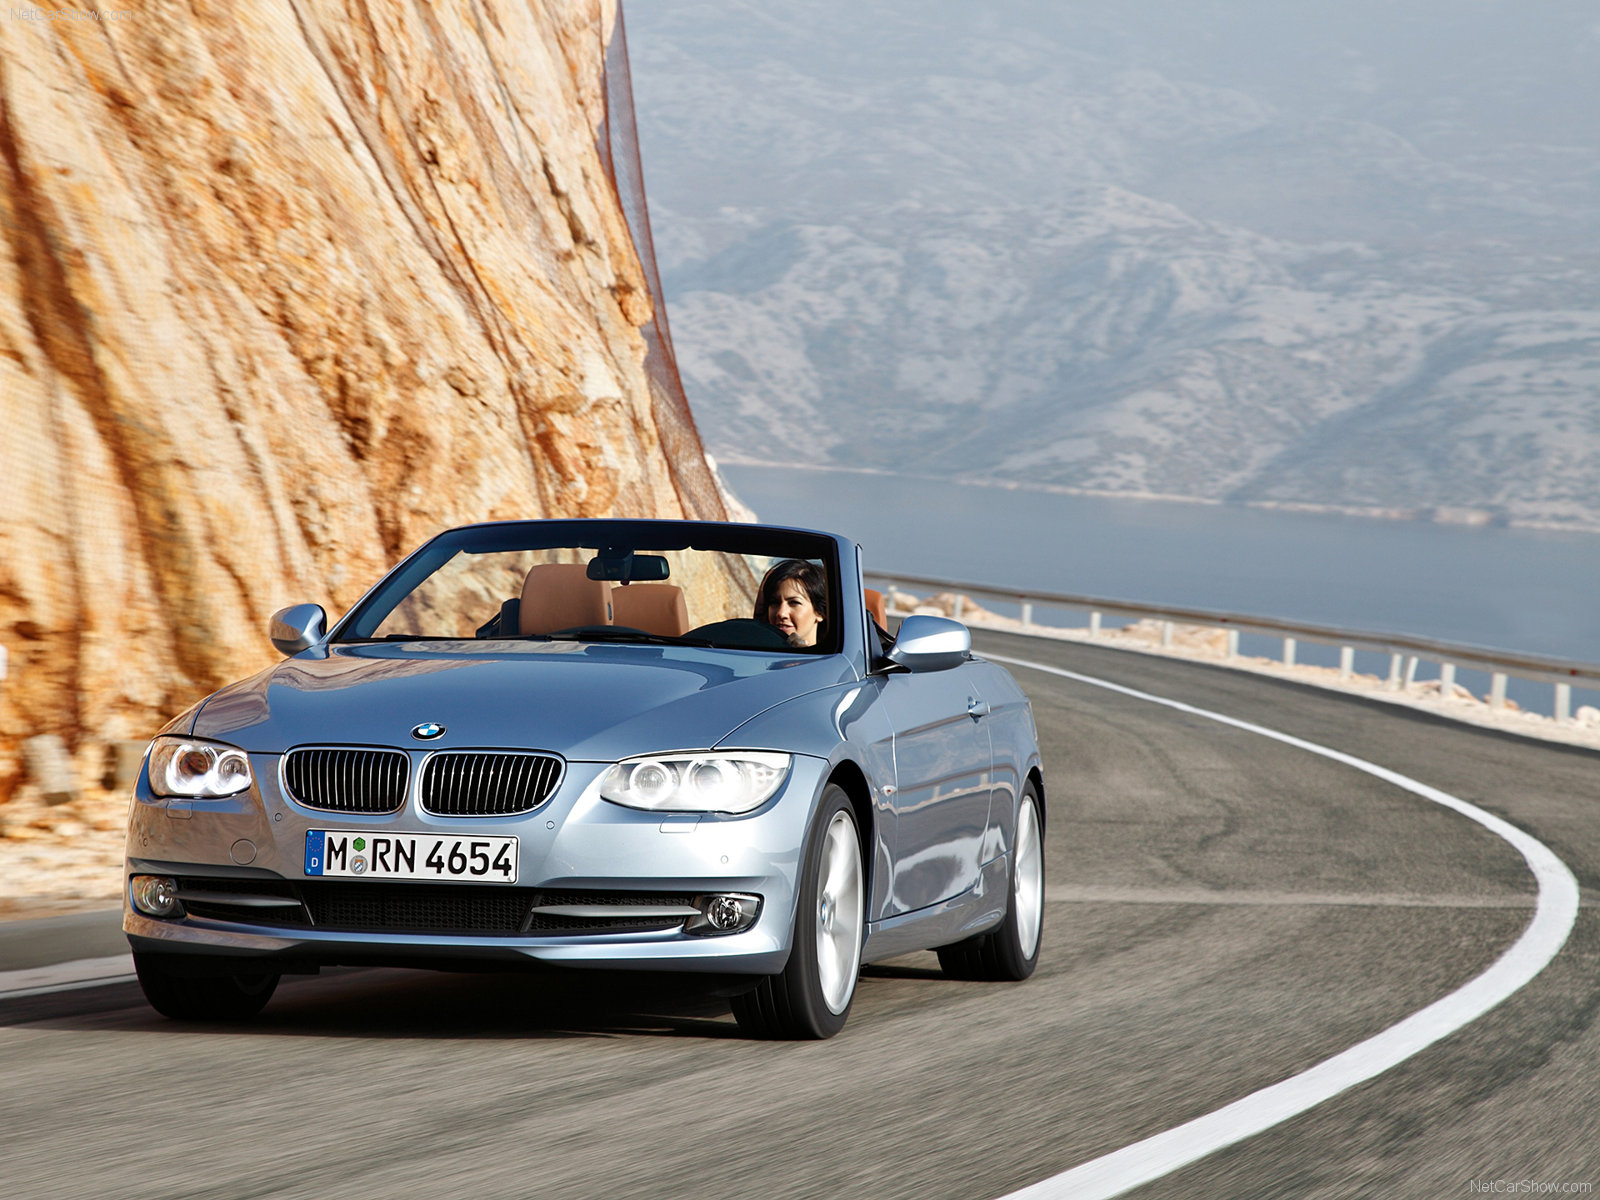 BMW 3-series E93 Convertible photo 70699